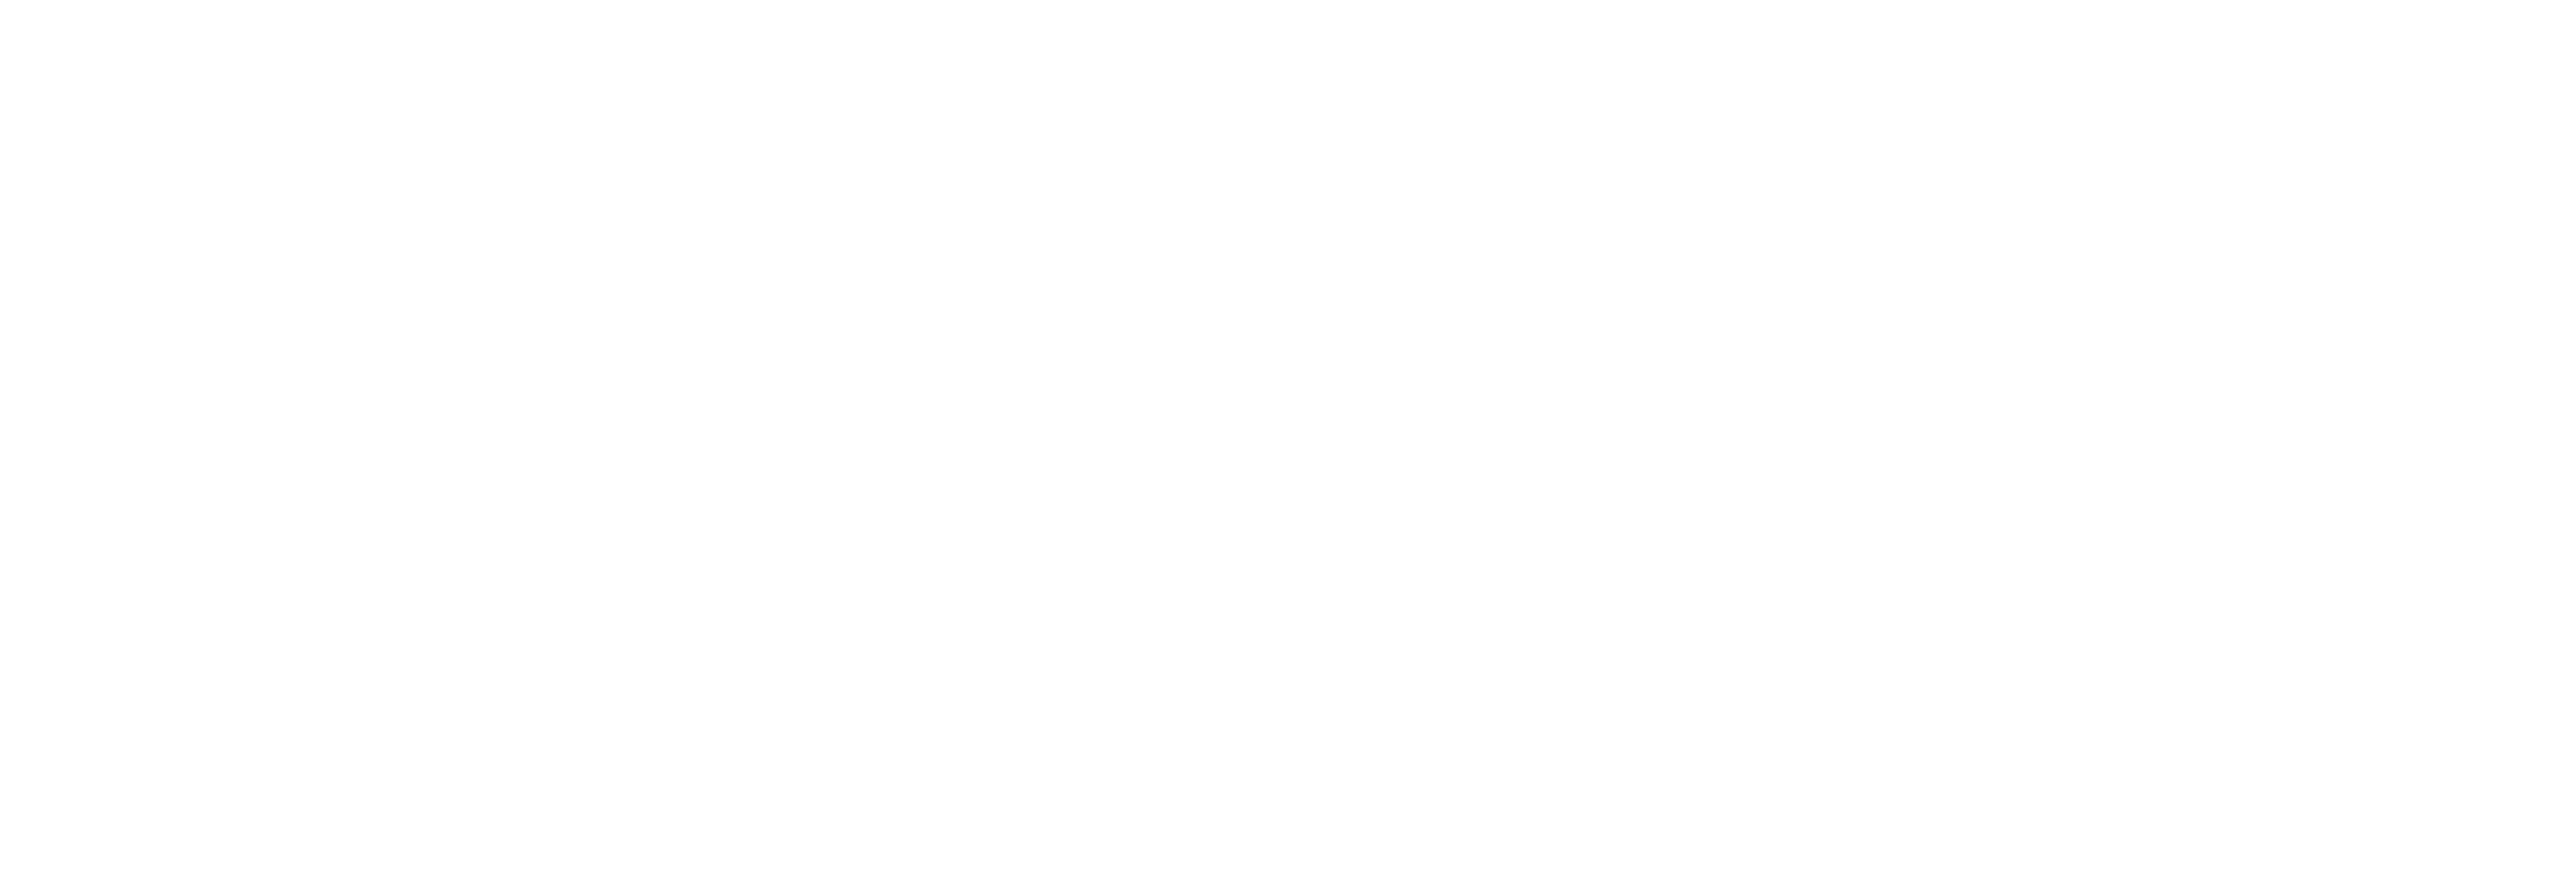 doterra-wellness-advocate-white